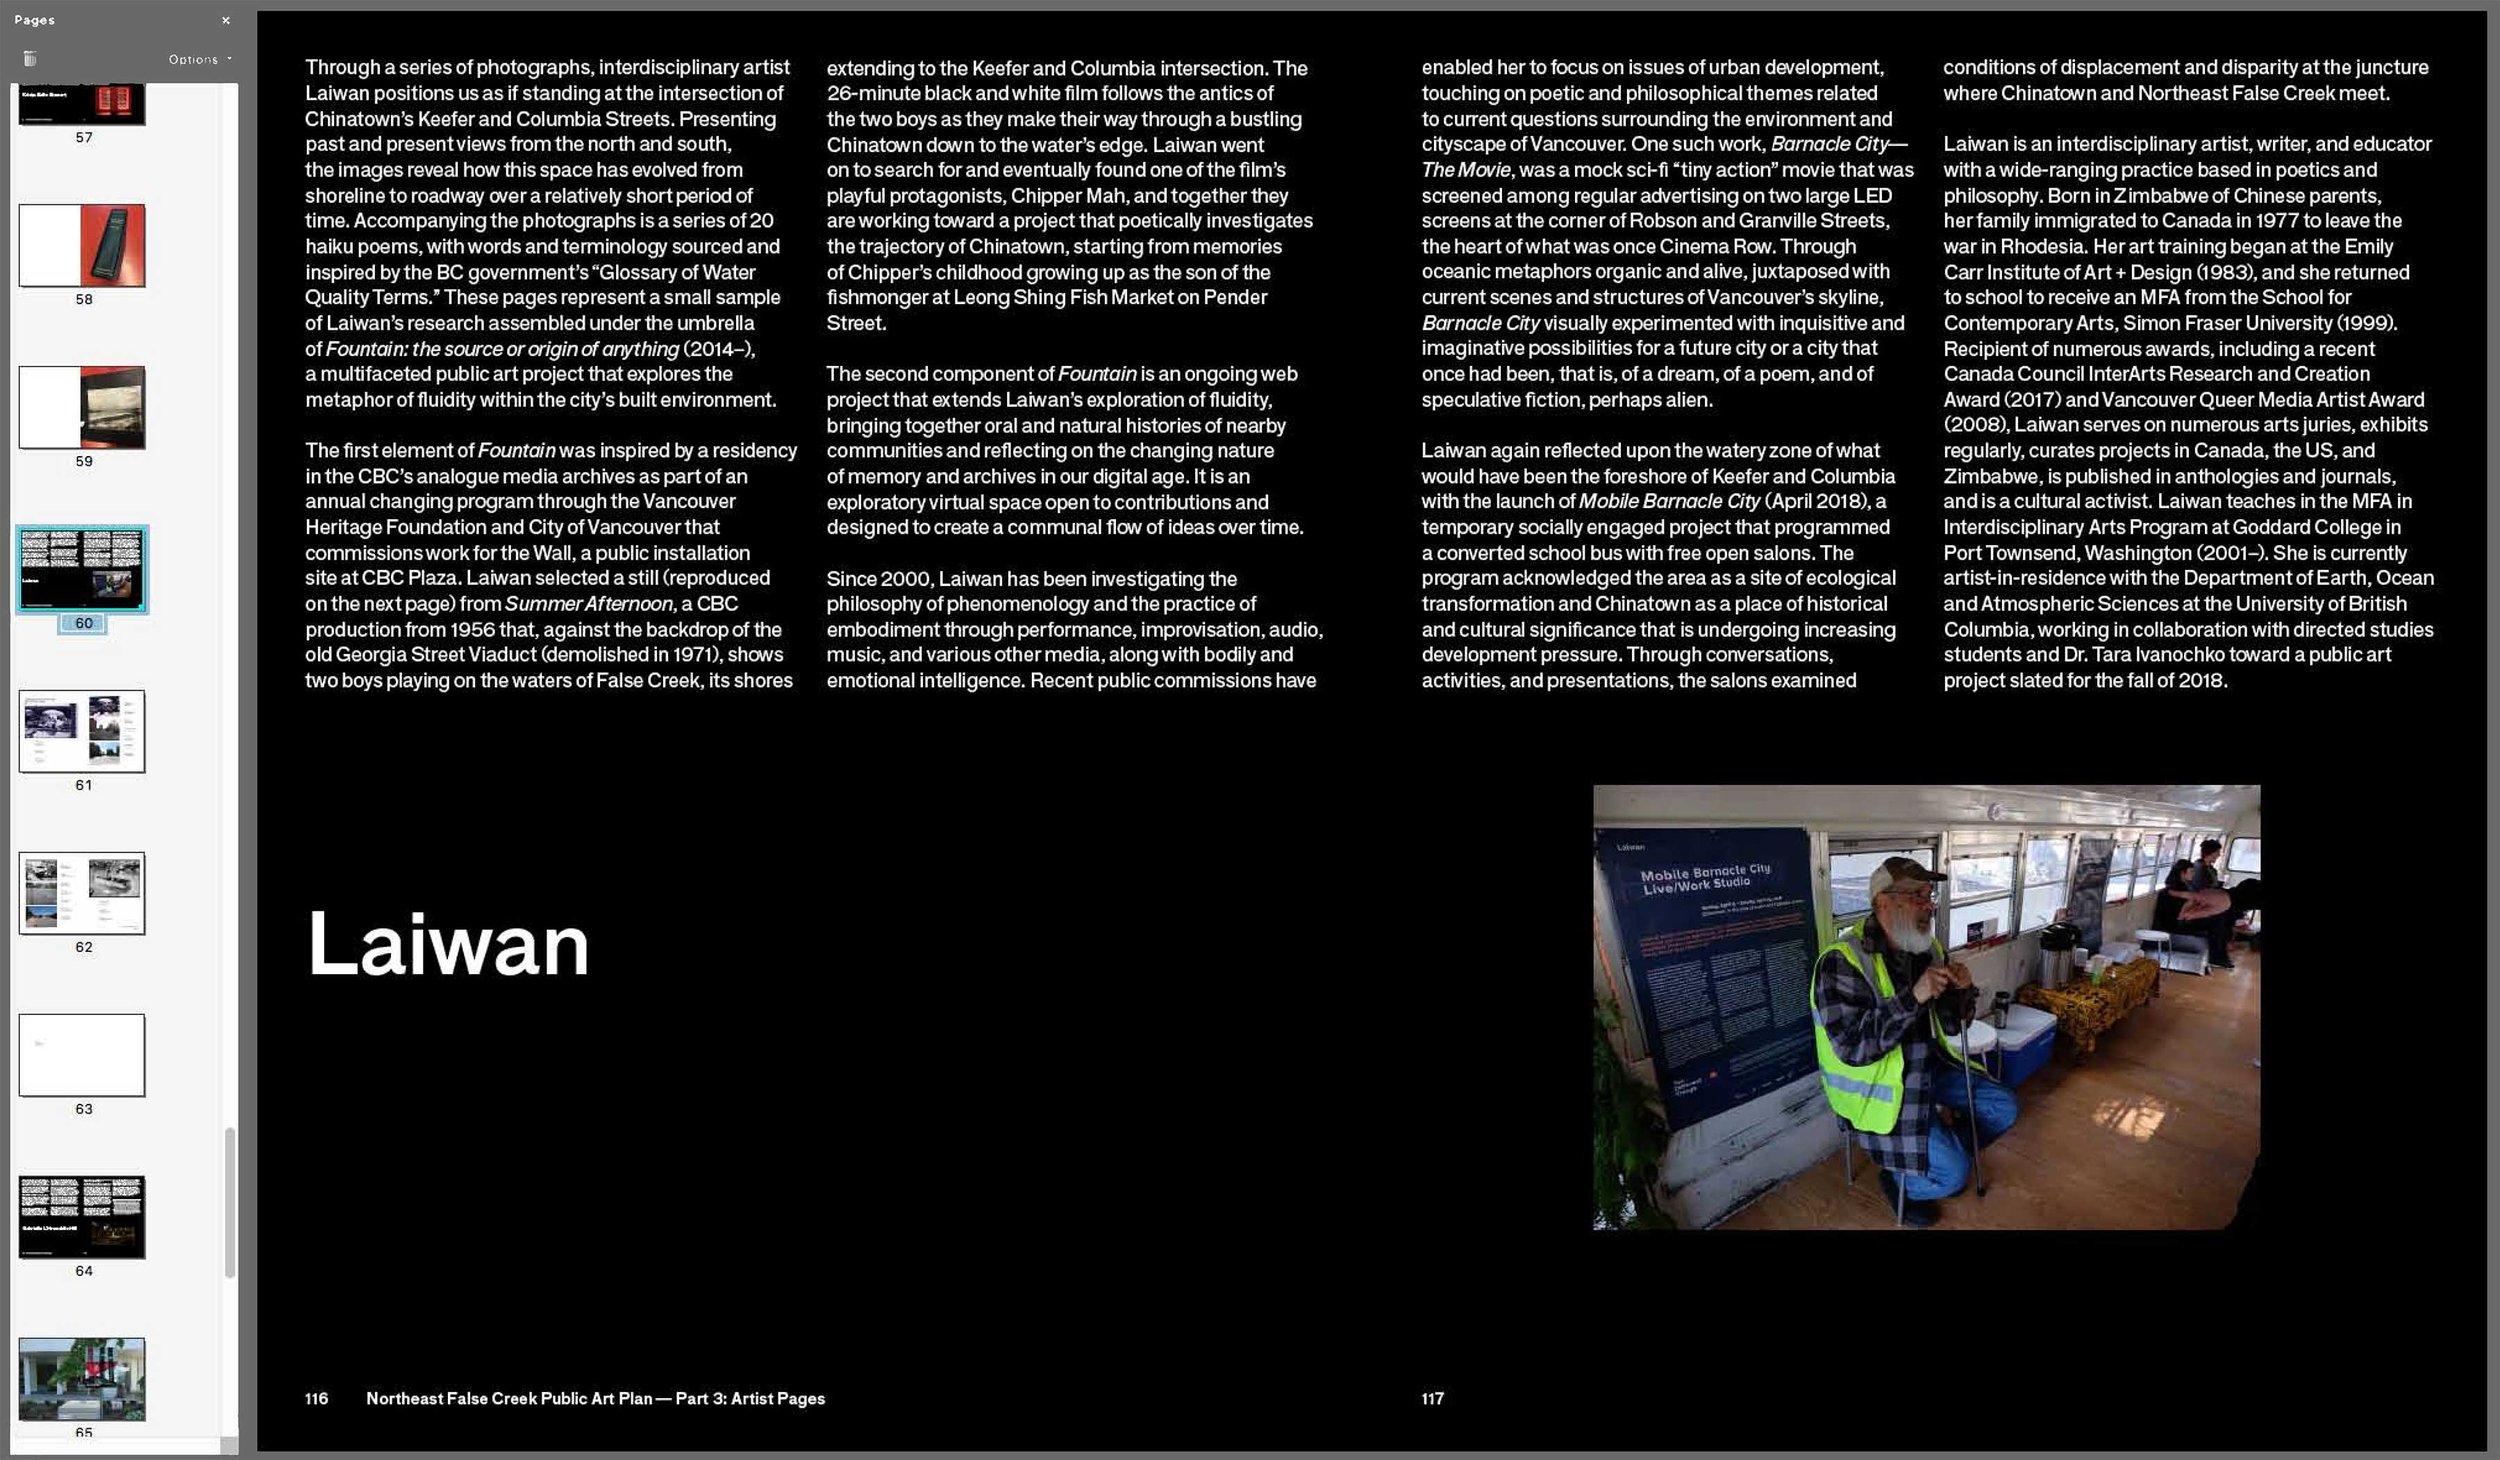 Laiwan-NEFC-Public-Art-Plan-pg1.jpg